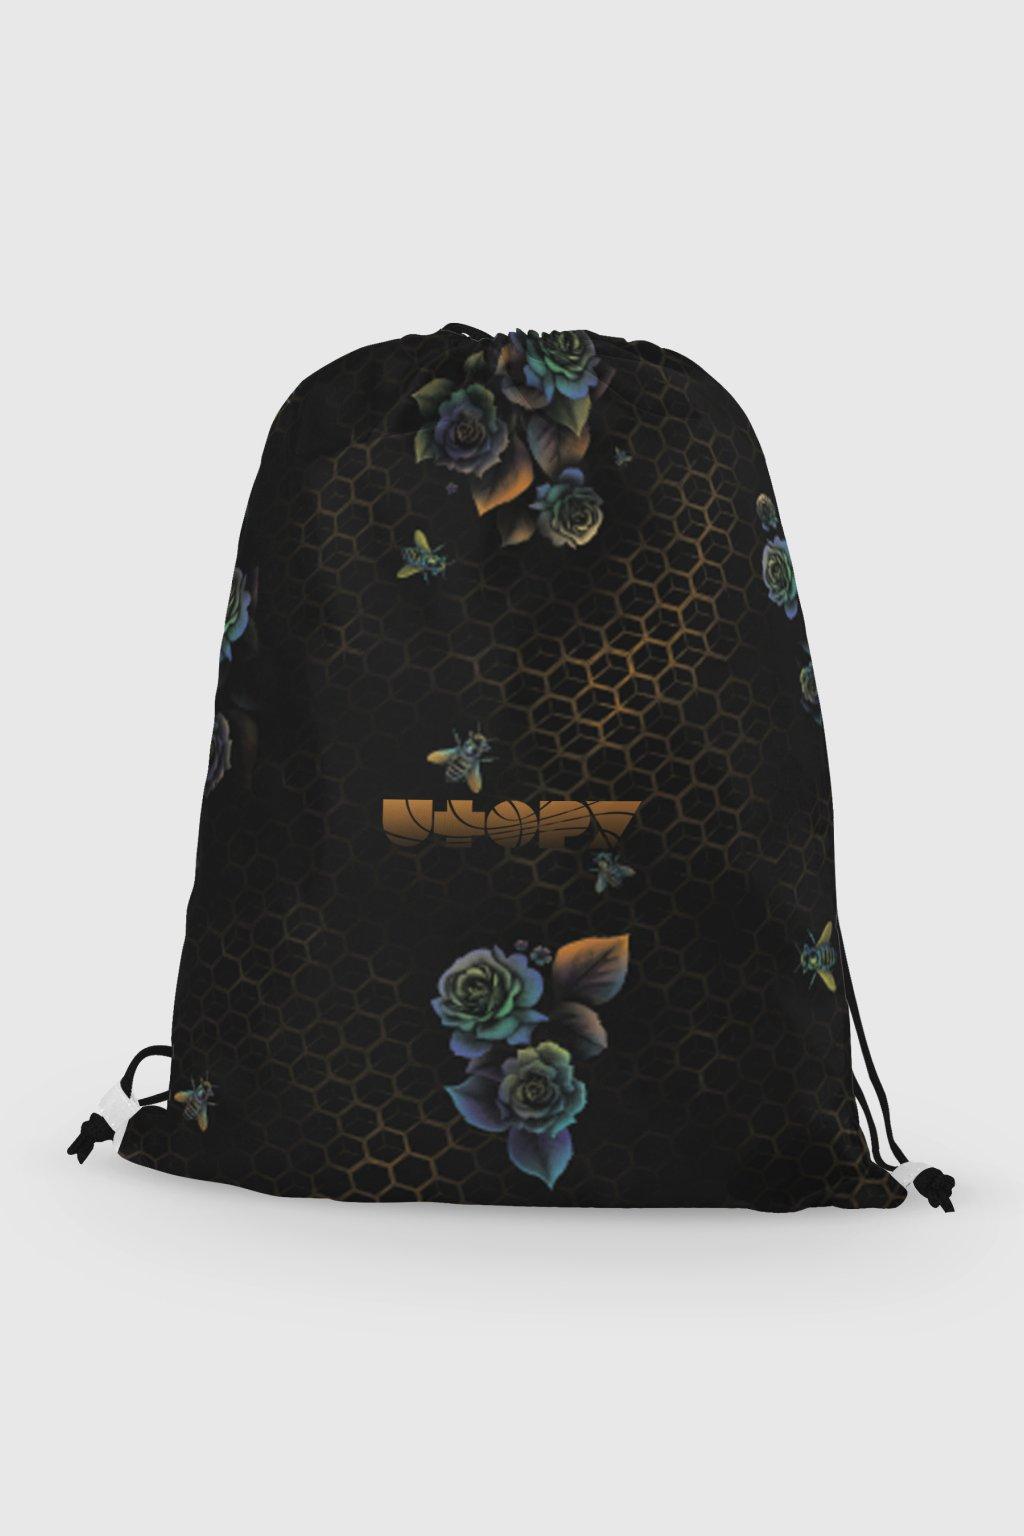 Vak Bees (1)